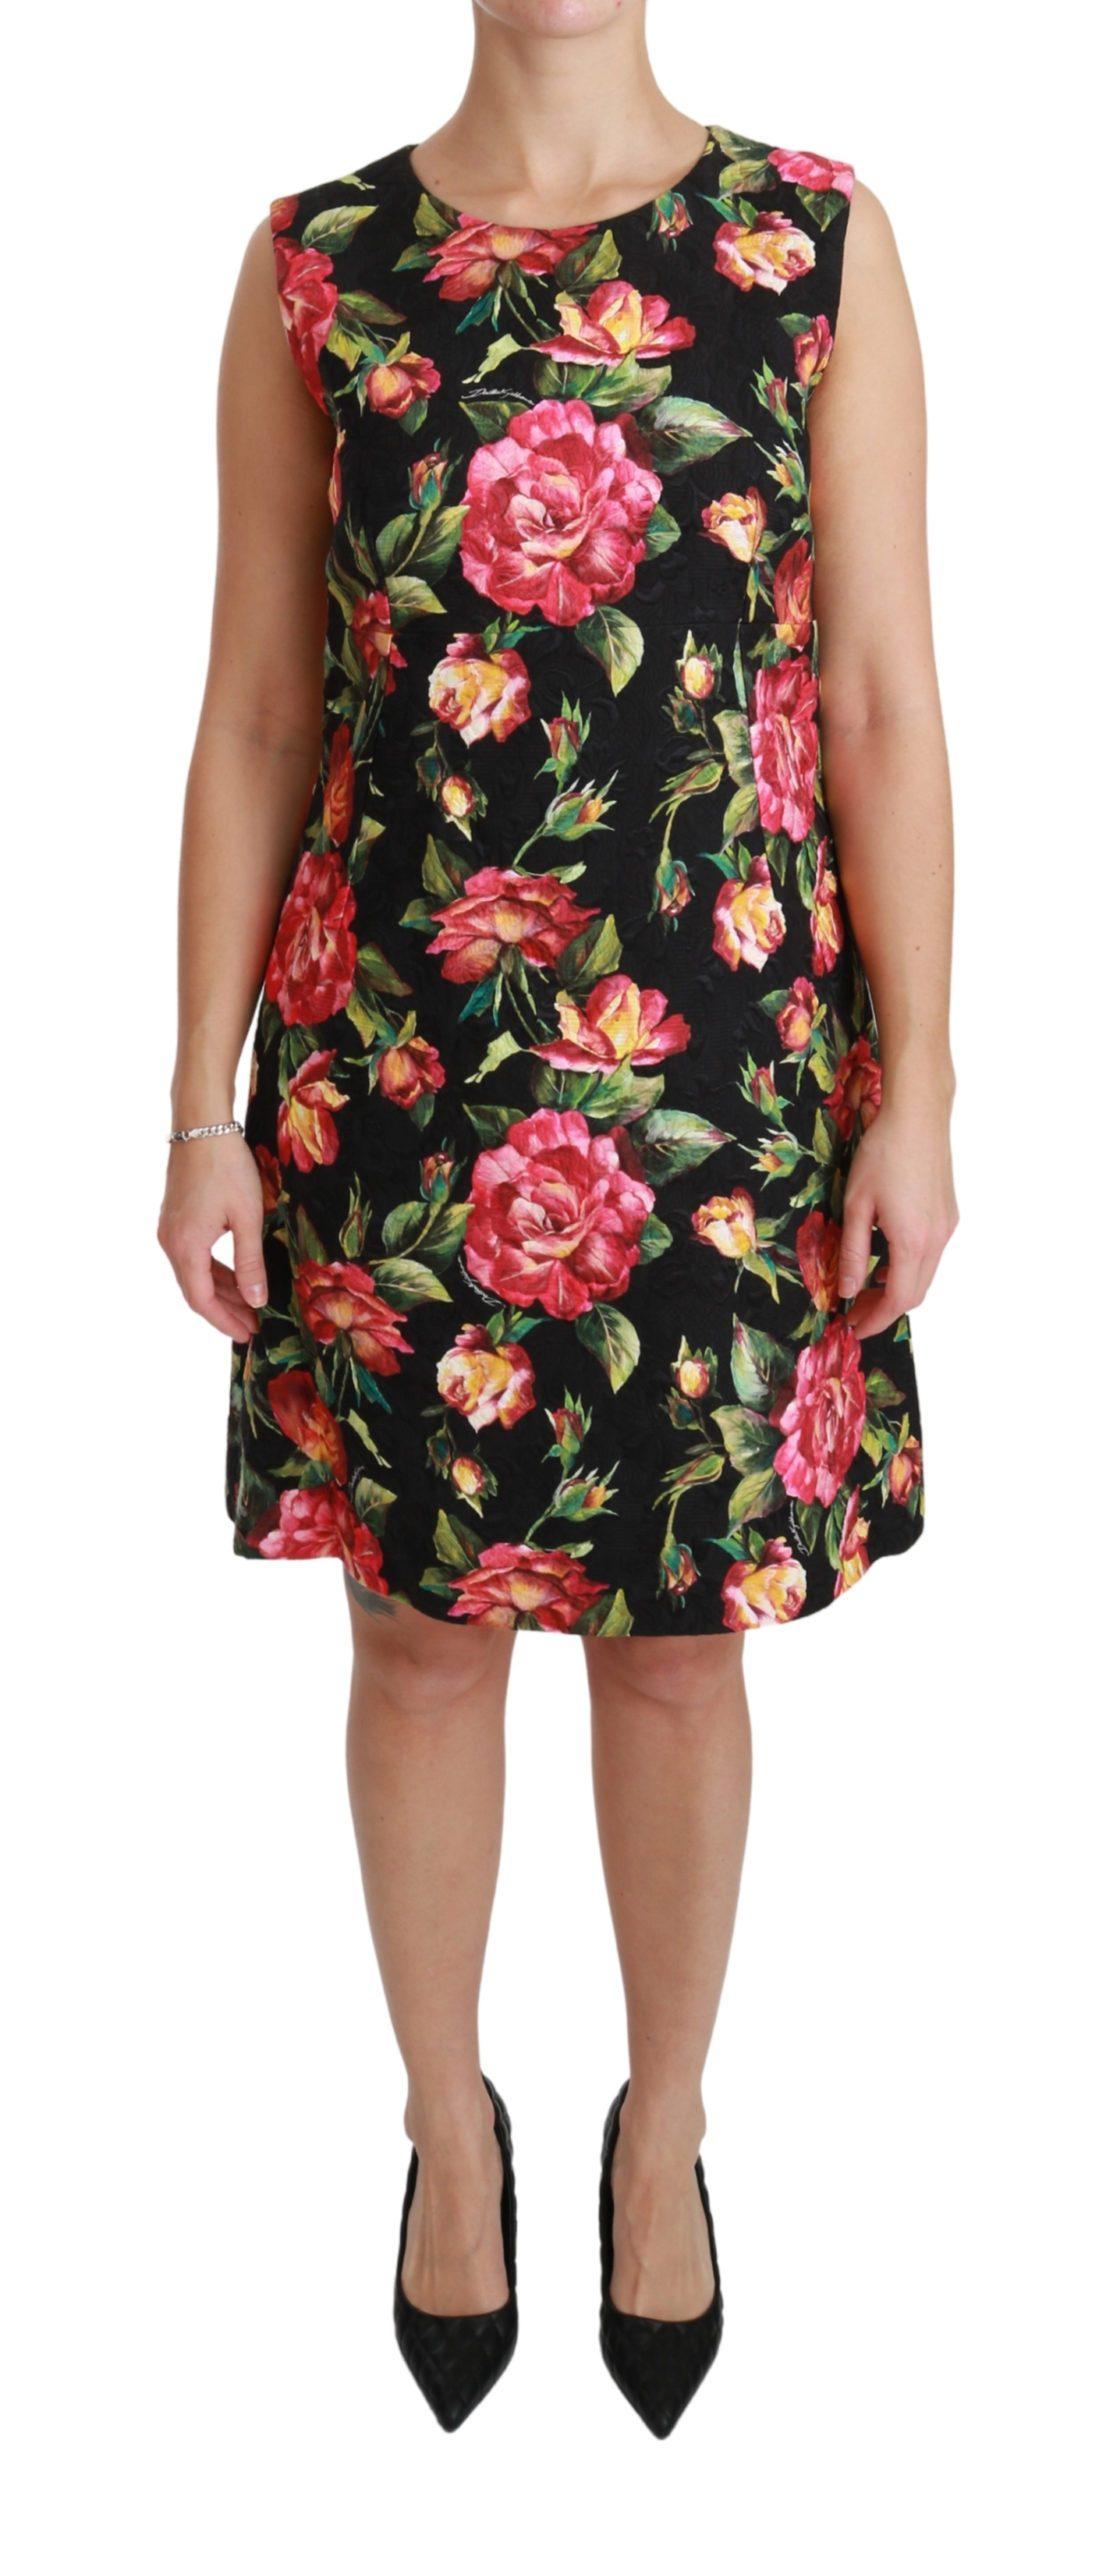 Dolce & Gabbana Women's Floral Shift A-line Mini Dress Black DR2473 - IT44|L